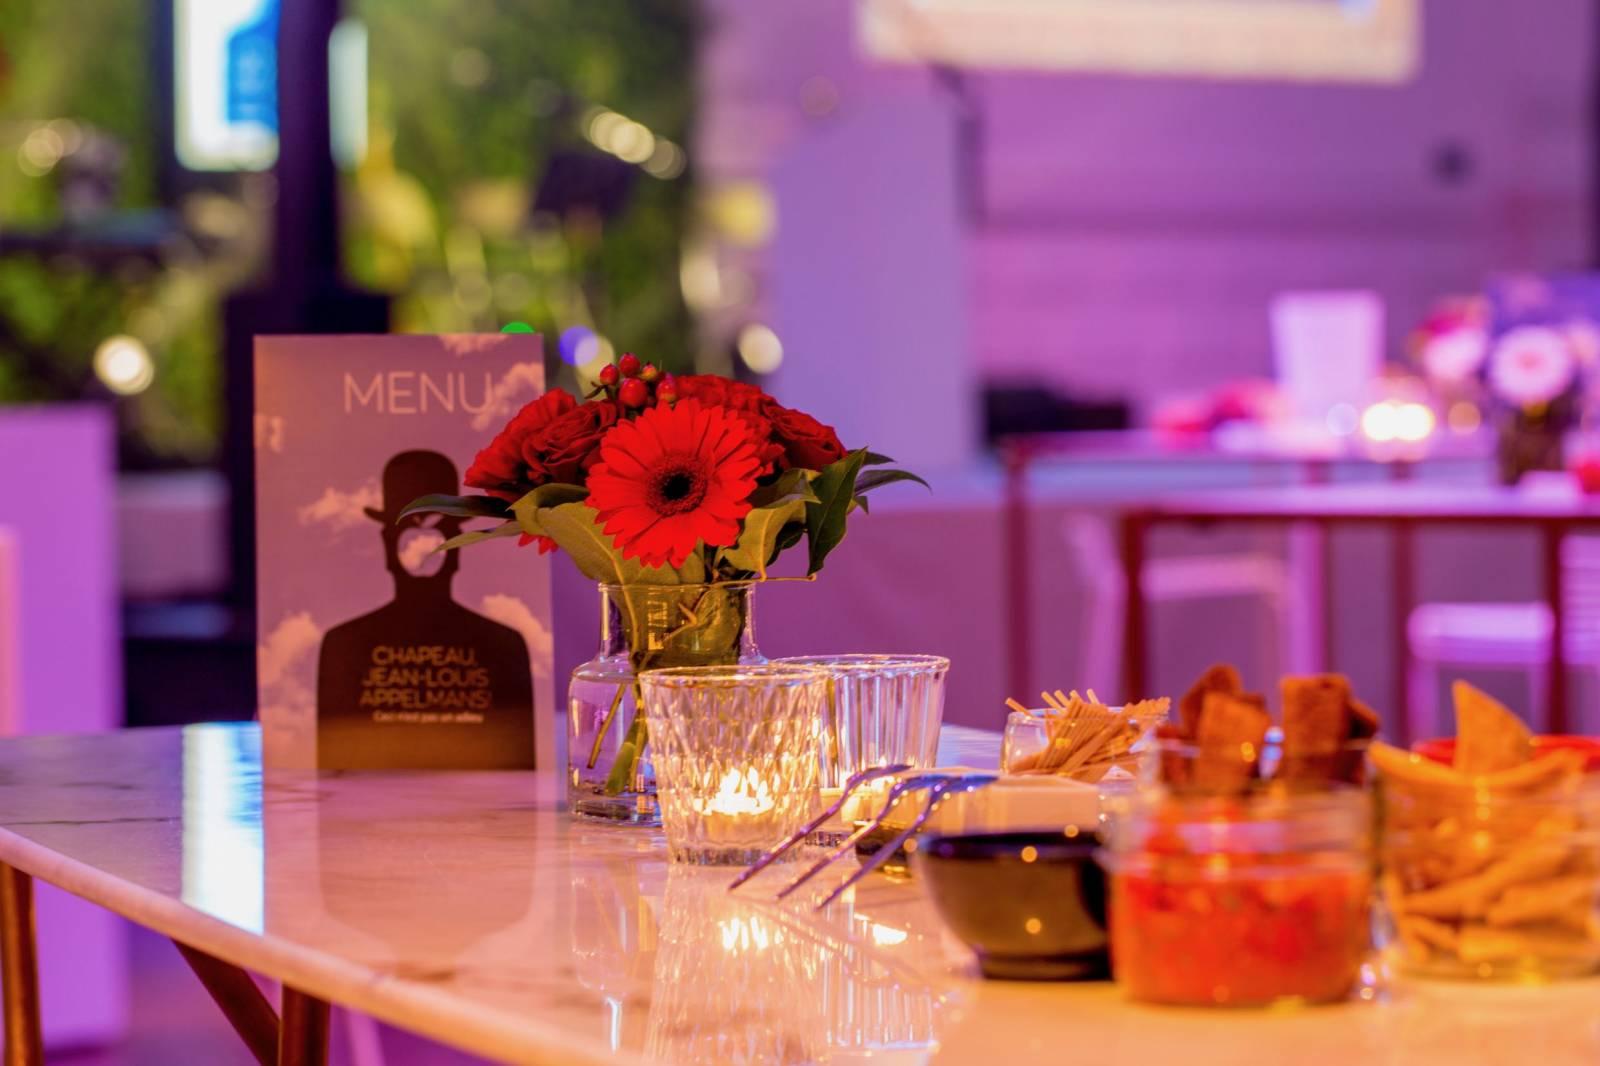 Insieme - Catering - Cateraar - Traiteur - House of Events - House of Weddings - 2